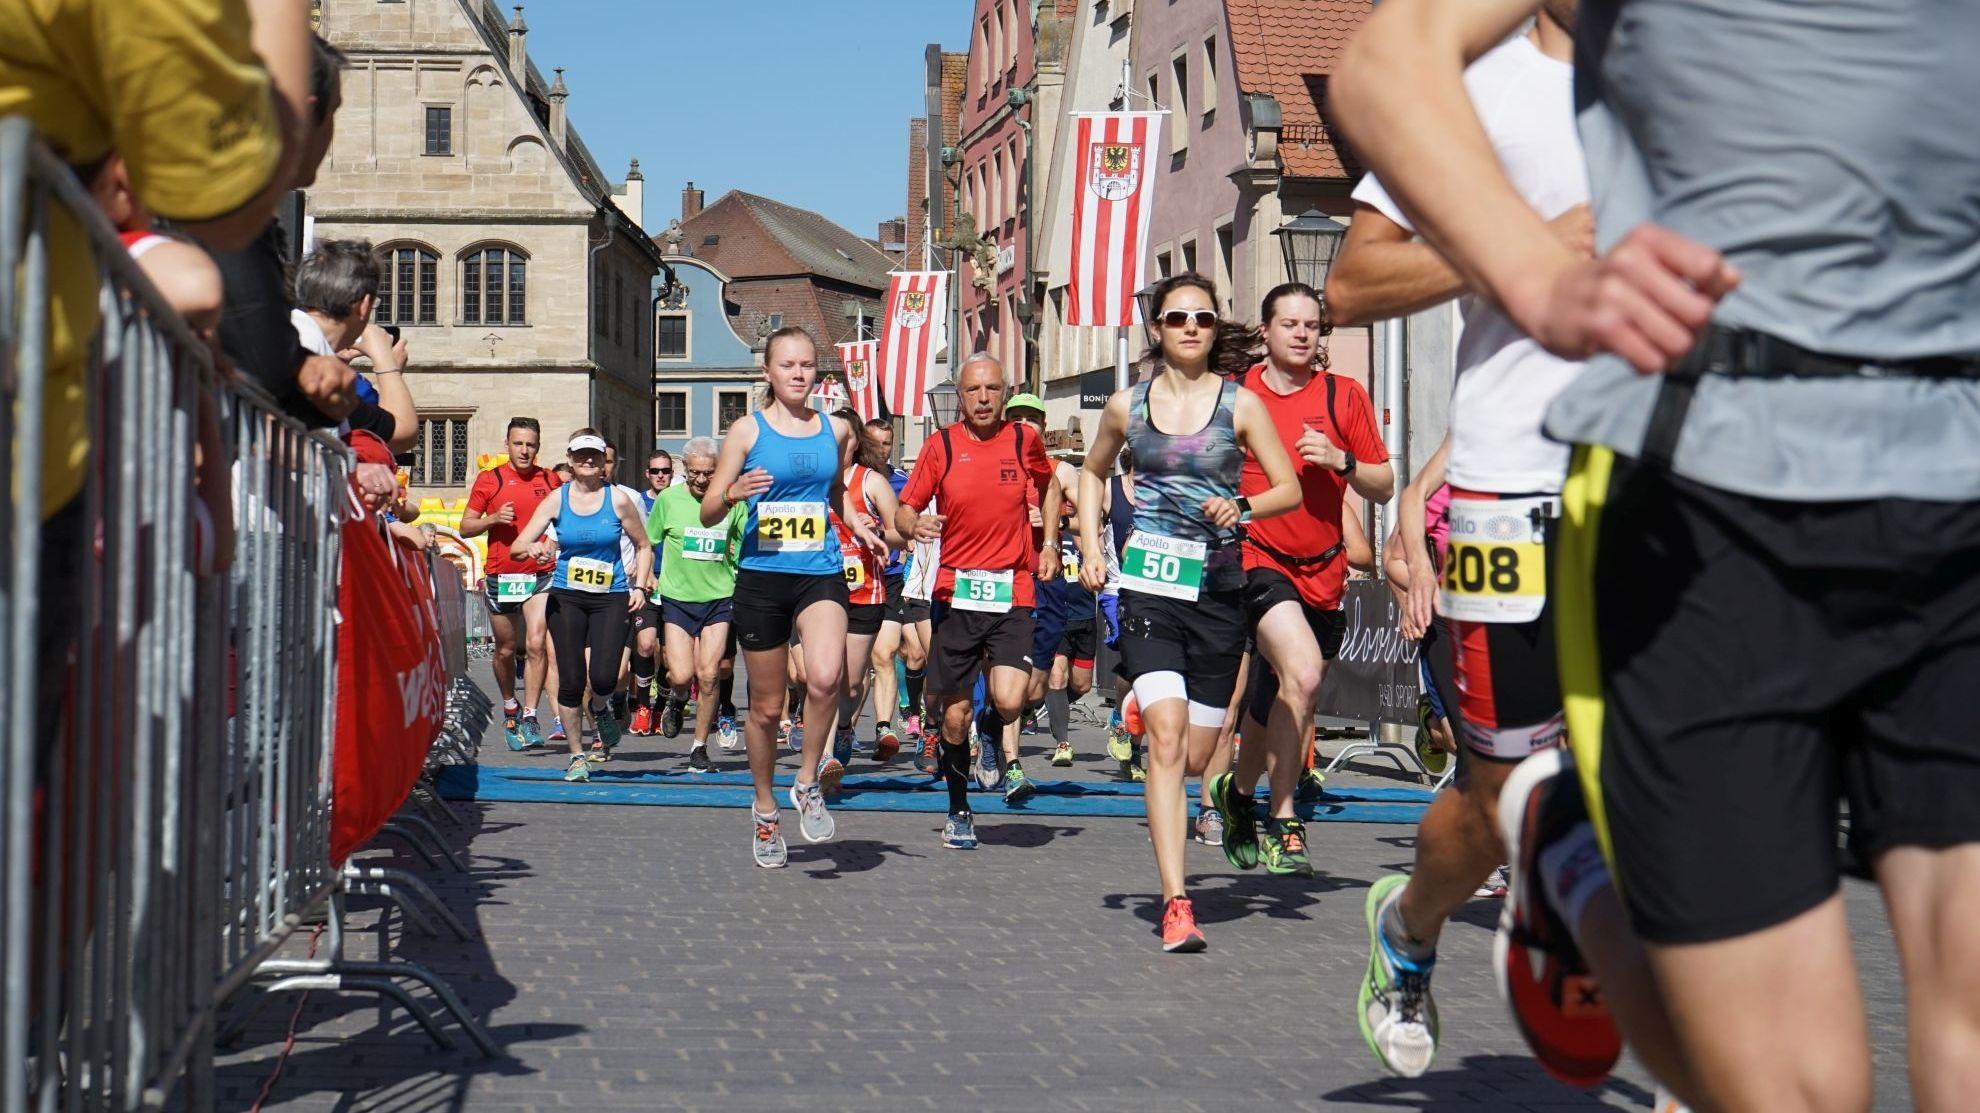 Weißenburger Altstadtlauf